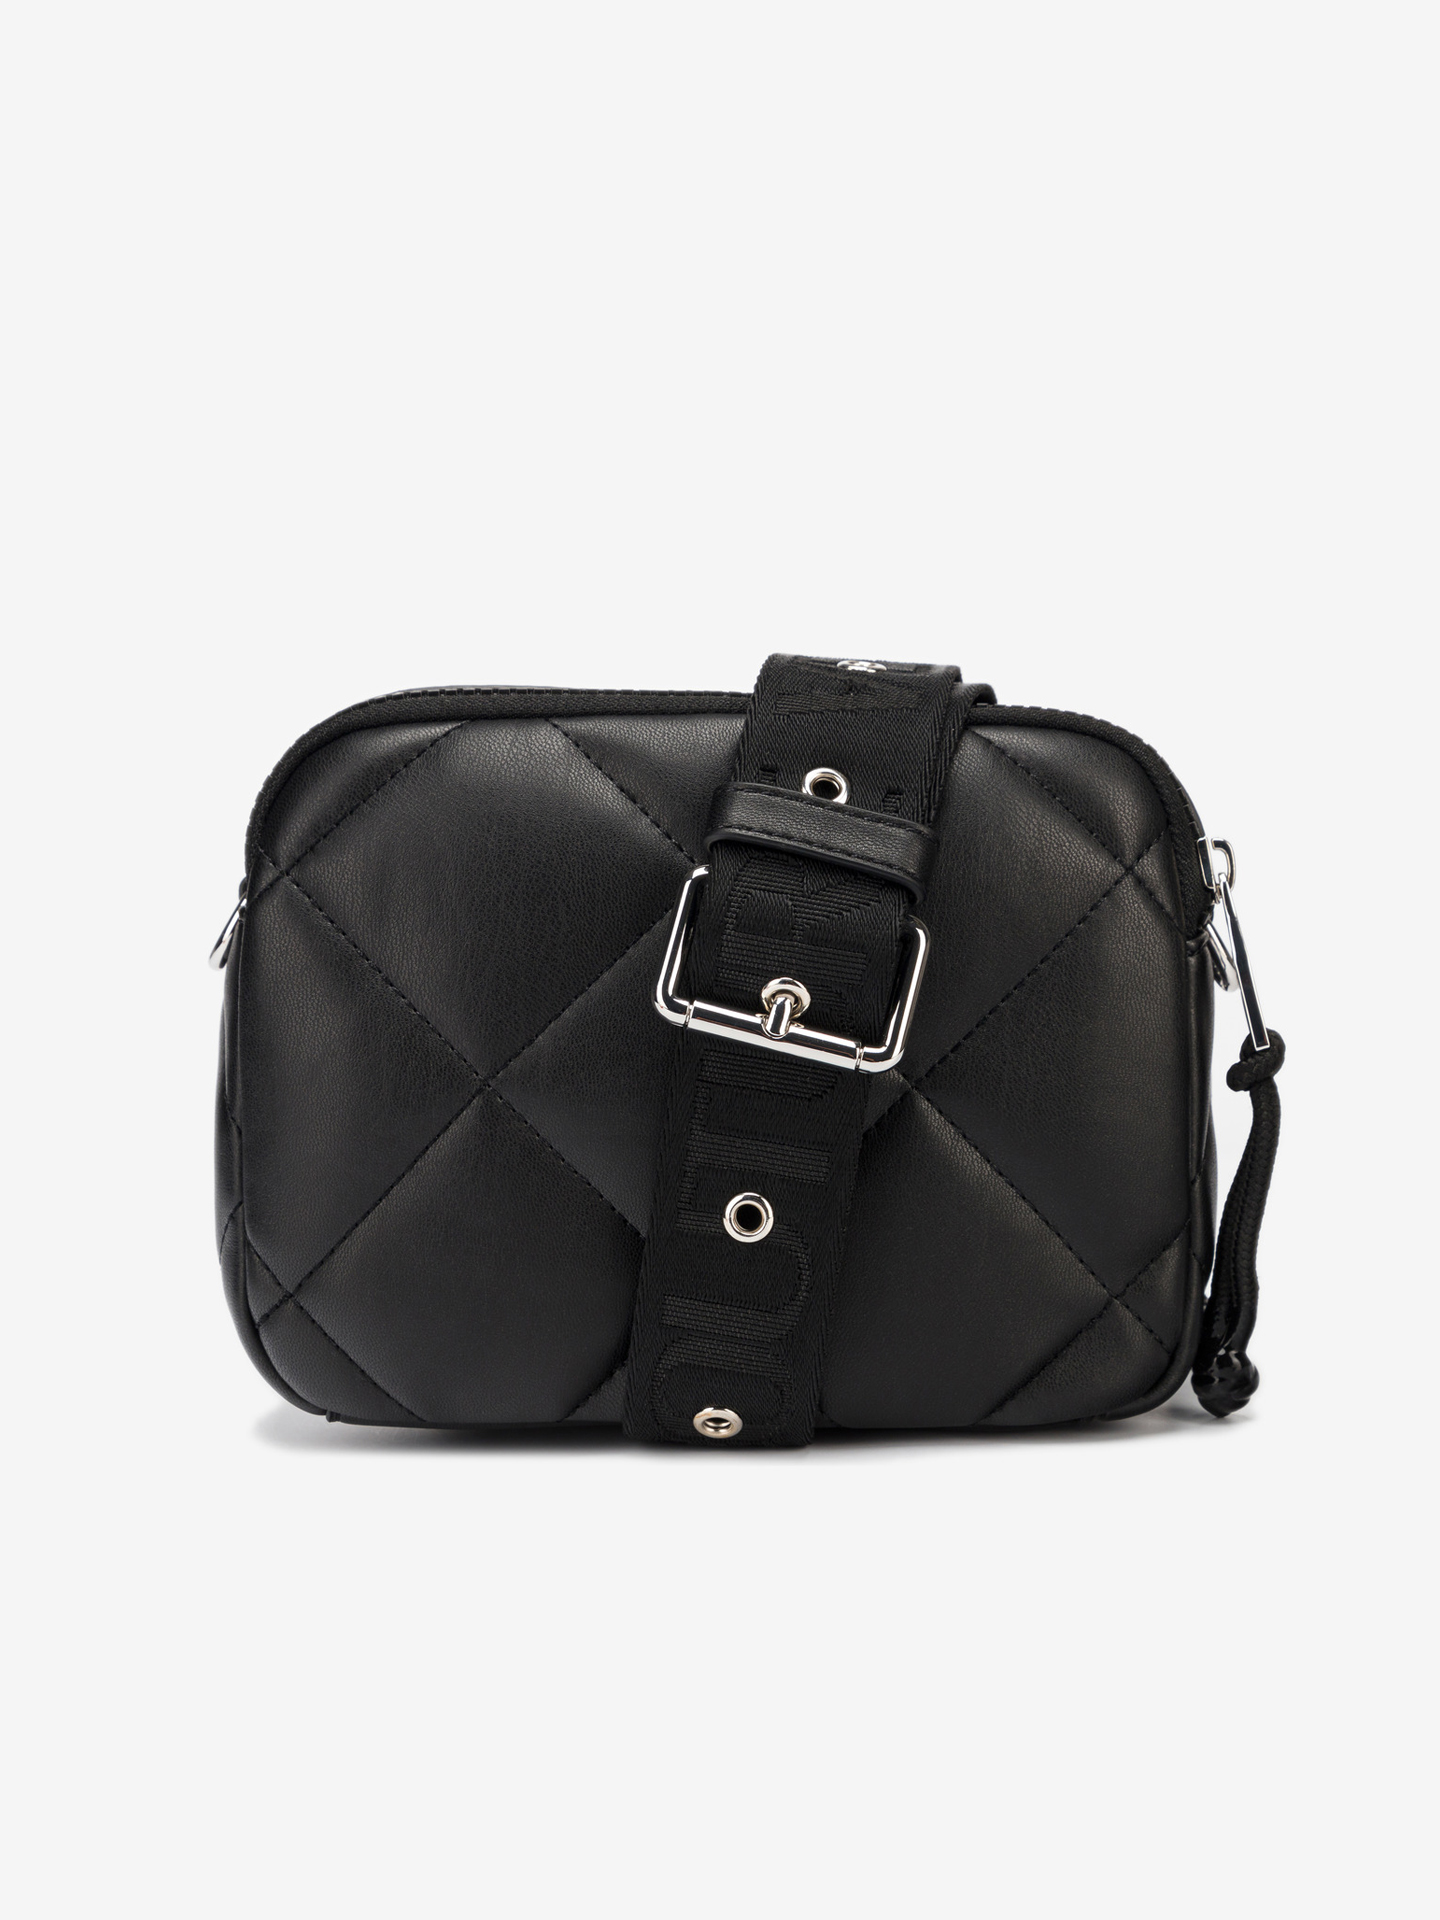 Versace Jeans Couture black crossbody handbag